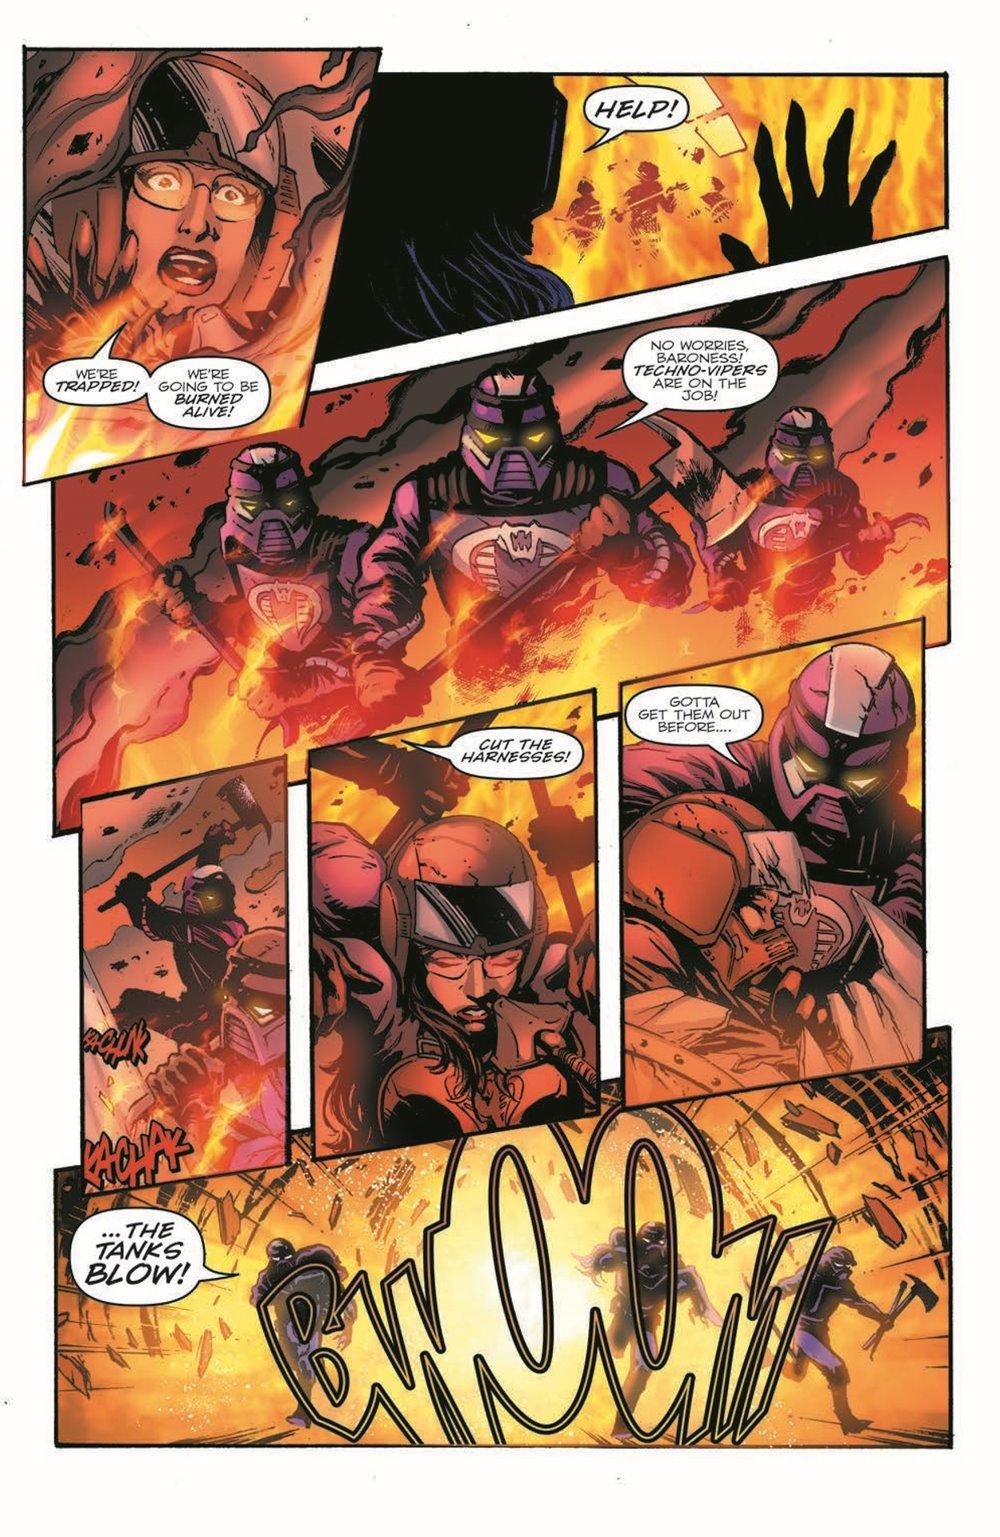 GIJoeRAH280-pr-7 ComicList Previews: G.I. JOE A REAL AMERICAN HERO #280